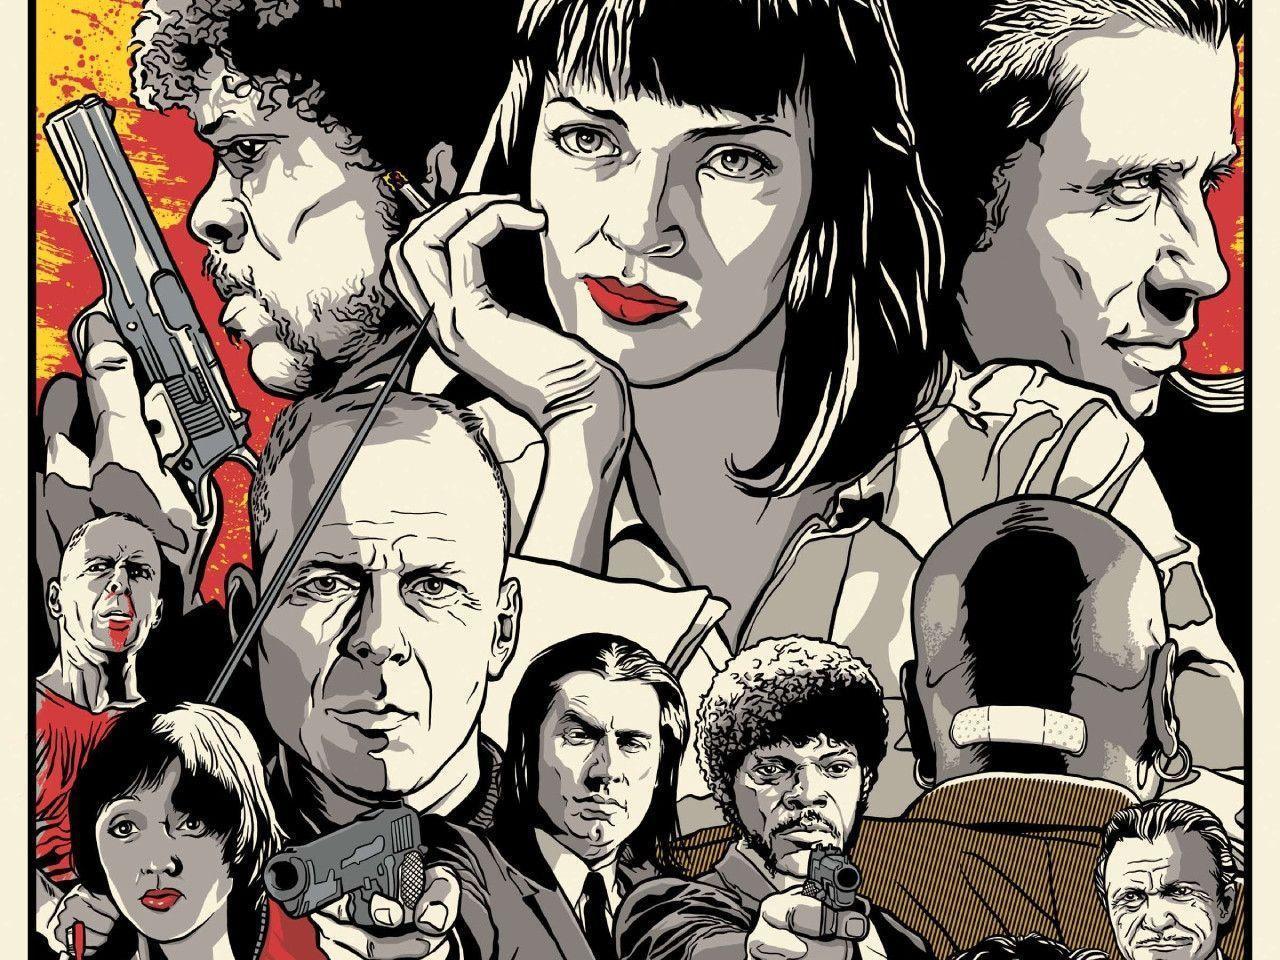 Pulp Fiction Wallpapers - Wallpaper Cave